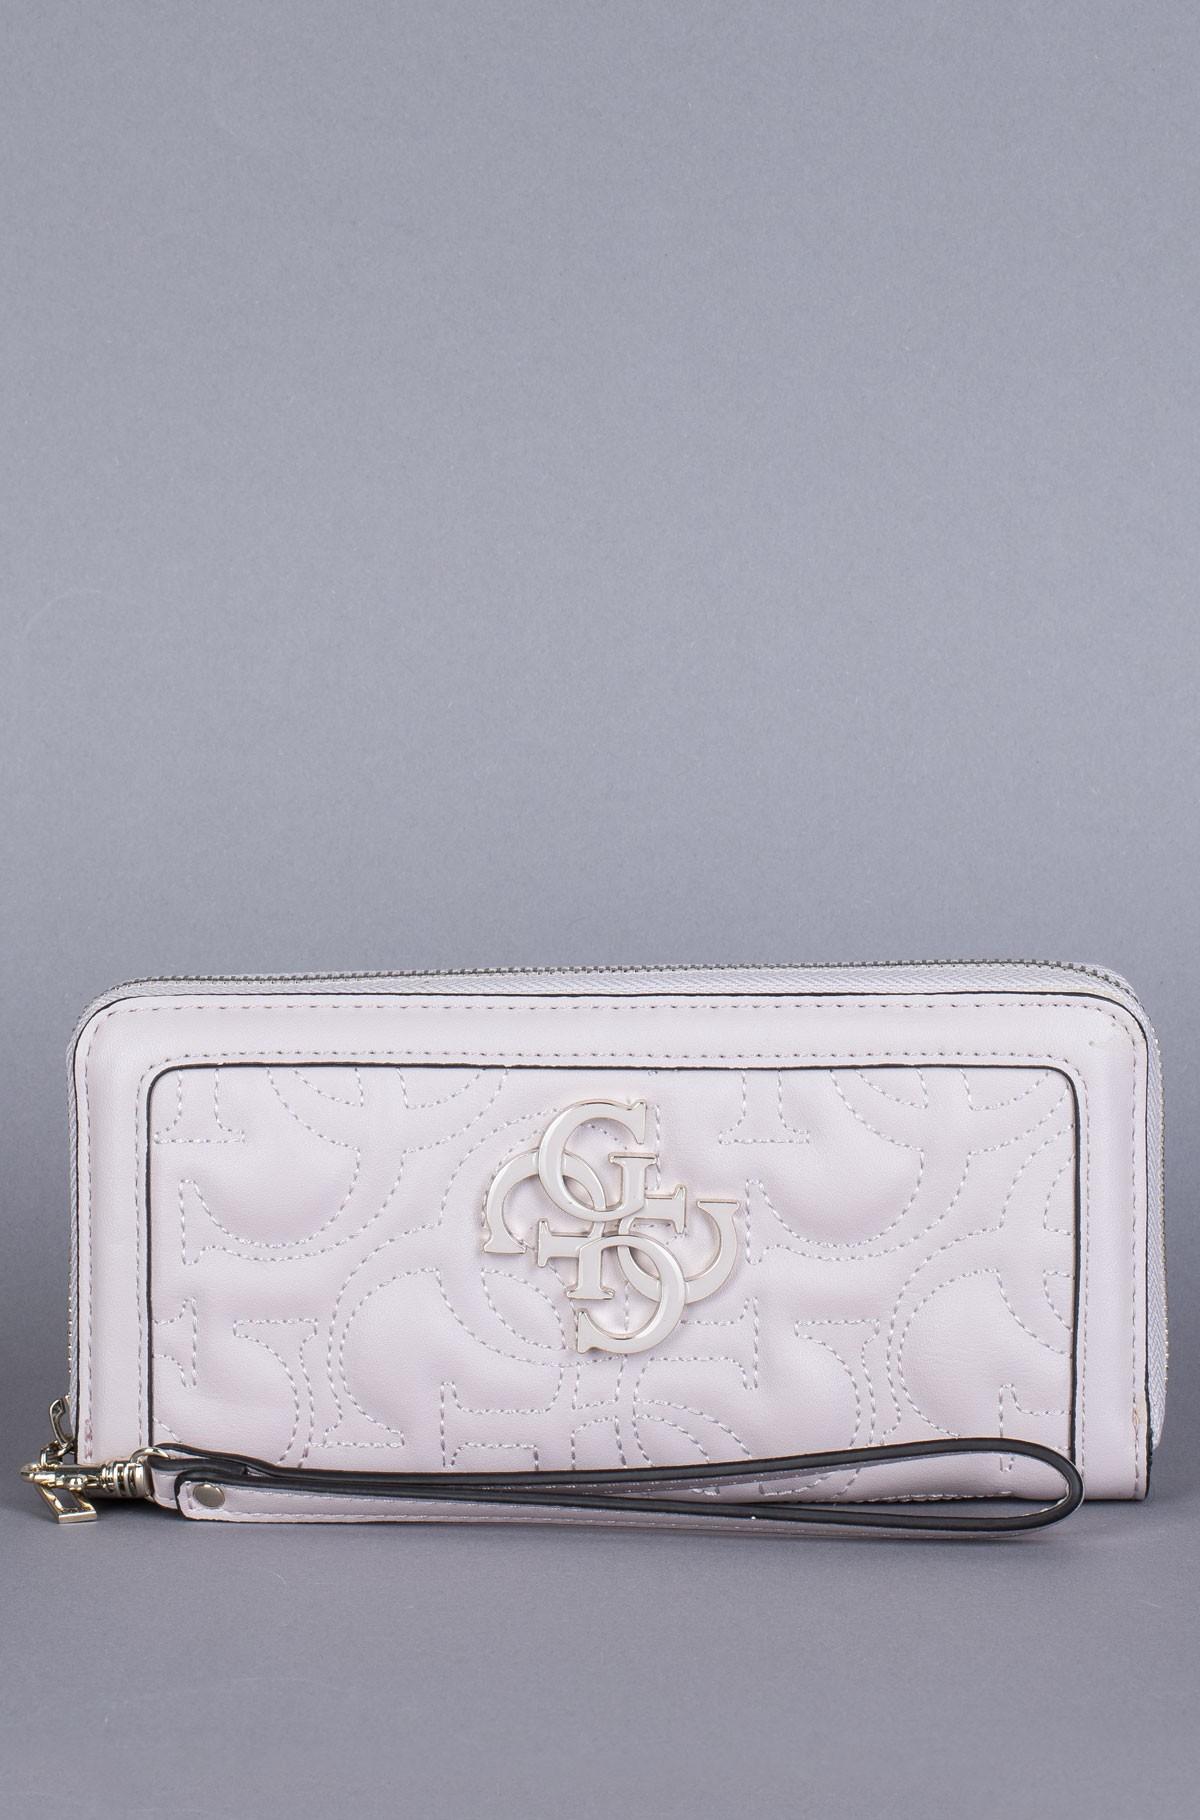 Wallet SWVG74 75460-full-1